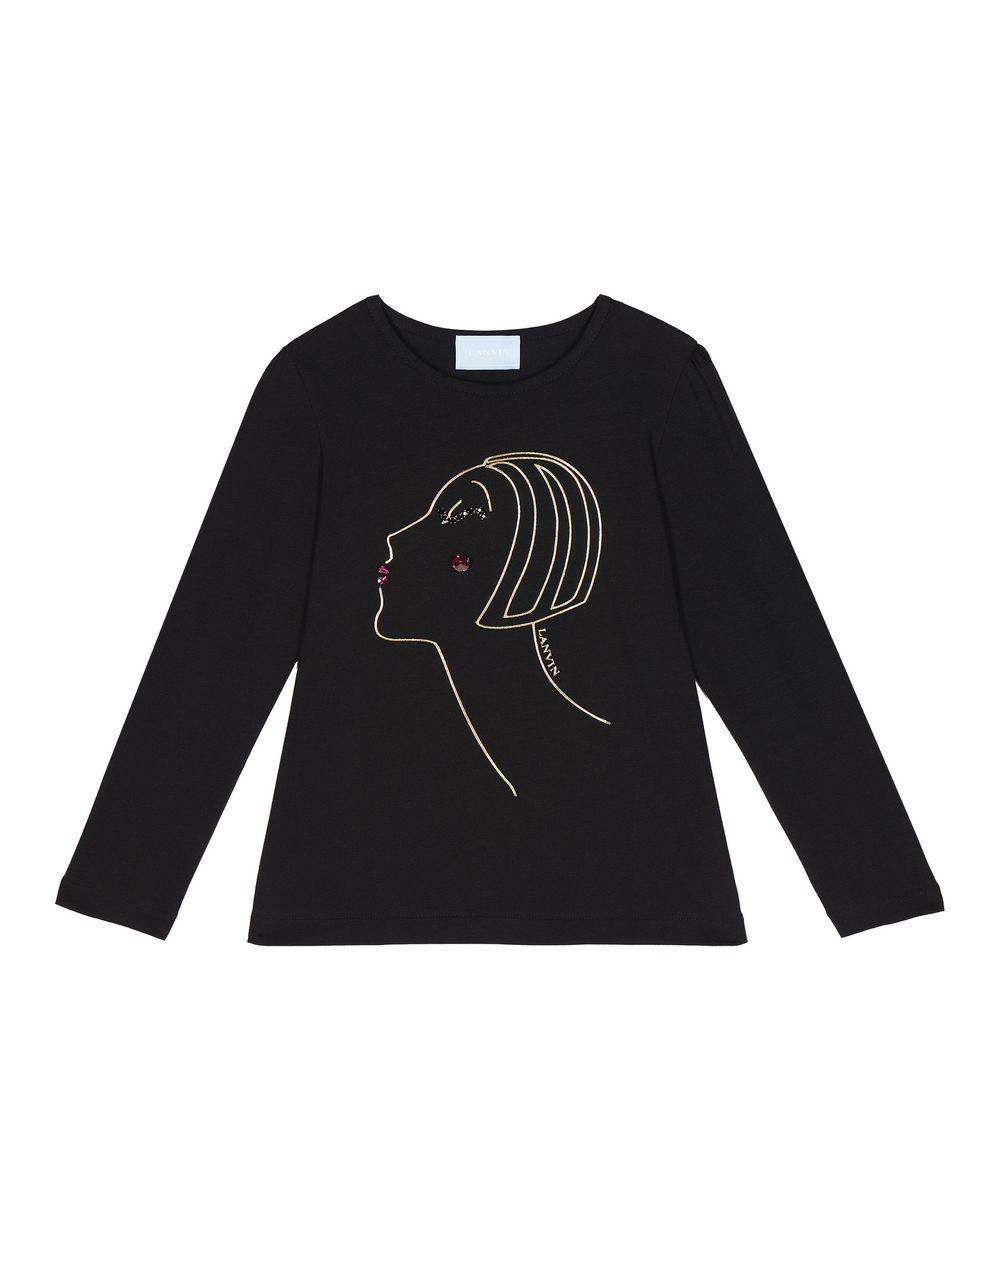 c1a2d36d9 Lanvin LONG SLEEVED PROFILE PRINT T SHIRT , Top Childrenswear ...